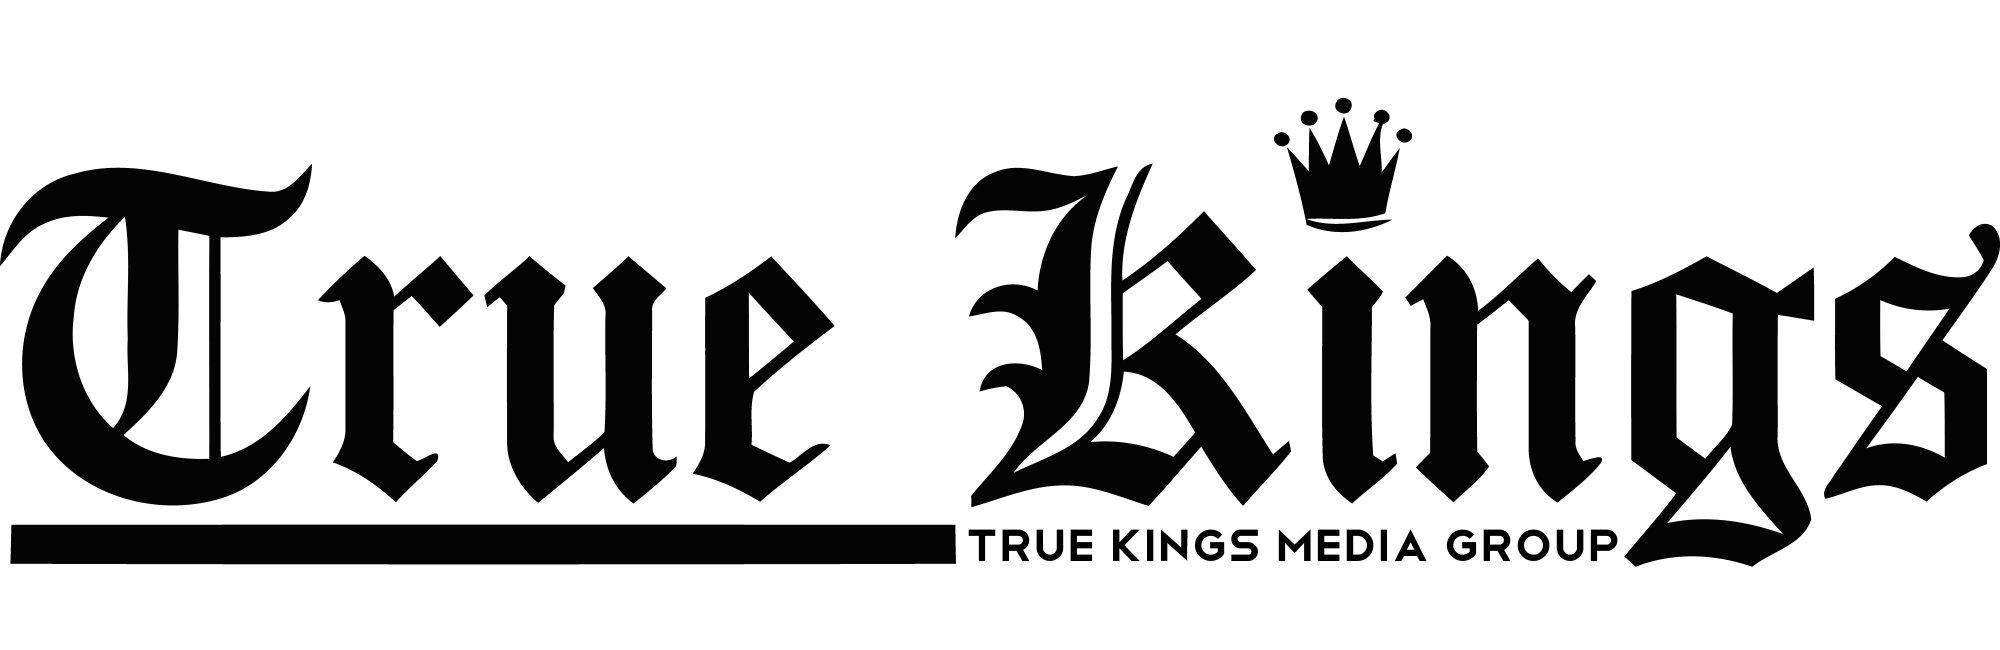 True-Kings-Media-Group-Letter-Head.jpg